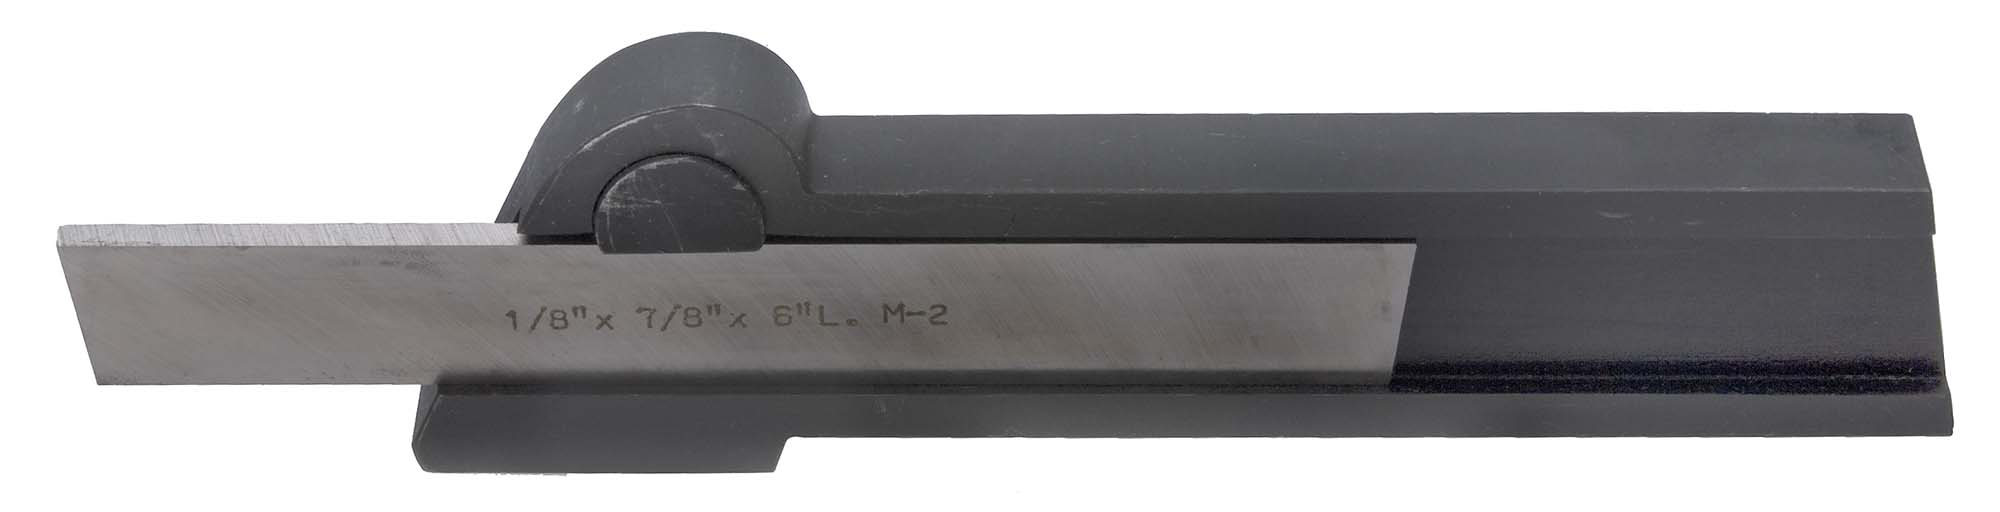 "1/2 X 1-1/8 Shank Straight Lathe Cutoff Tool Holder, holds 1/8 x 3/4"" Blades"